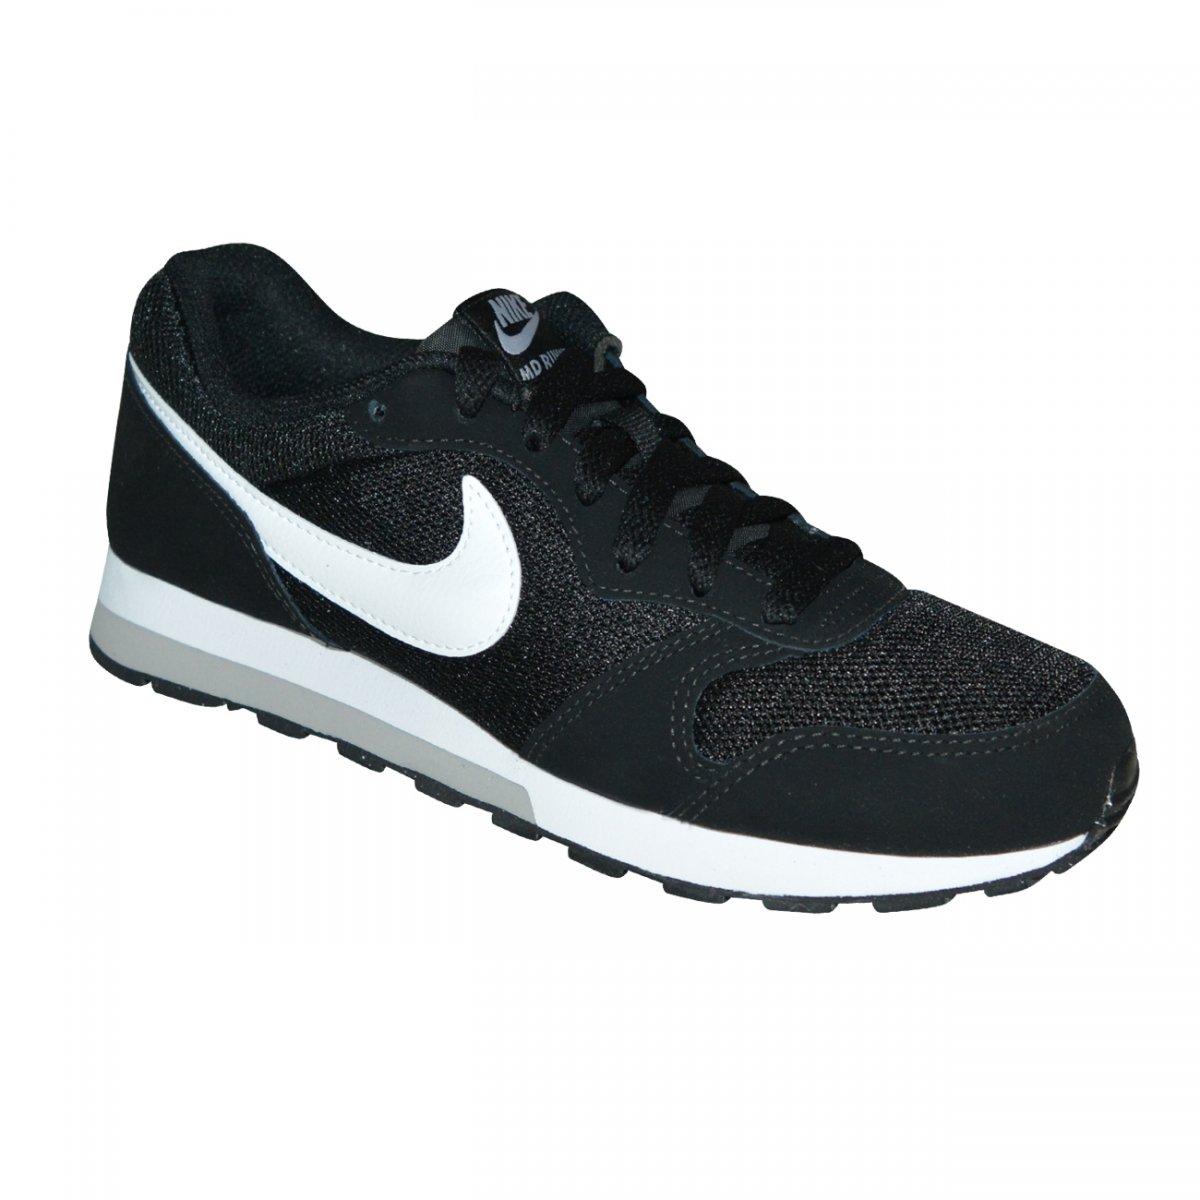 11b66f779 Tenis Nike Md Runner 2 Juvenil 807316 001 - Preto branco - Chuteira Nike